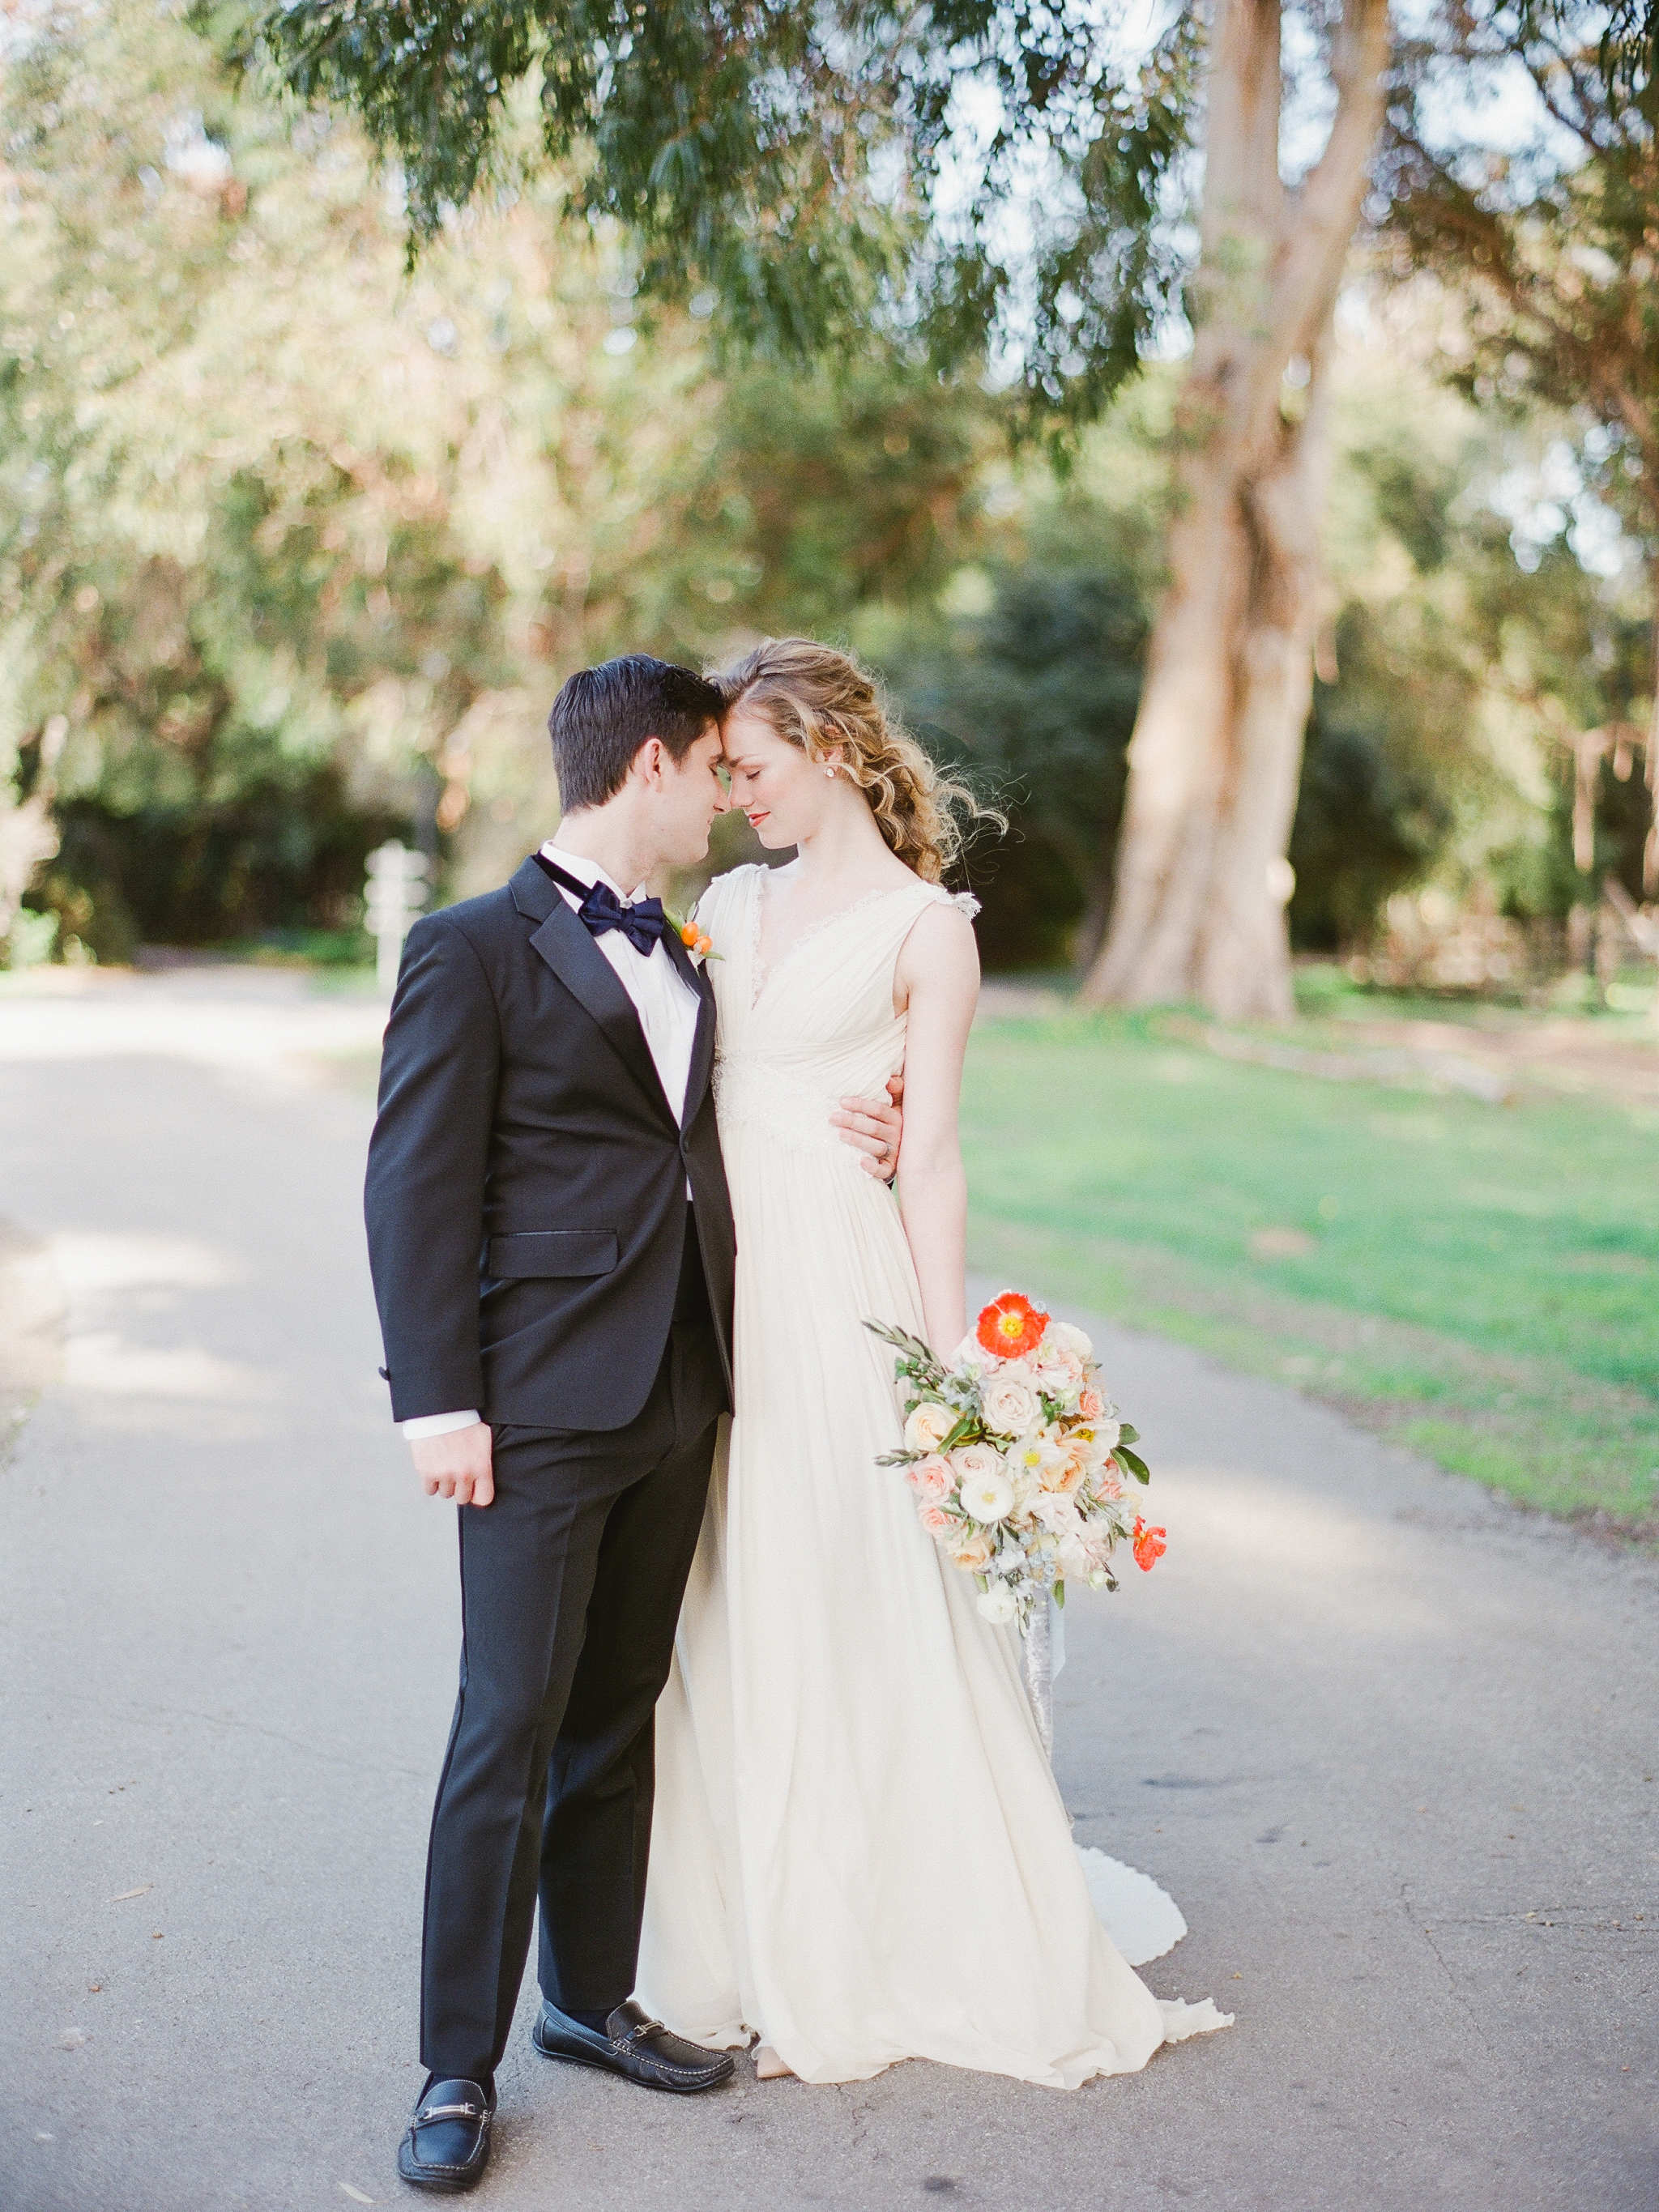 radostinaboseva-garden-wedding-brideandgroom-167.jpg